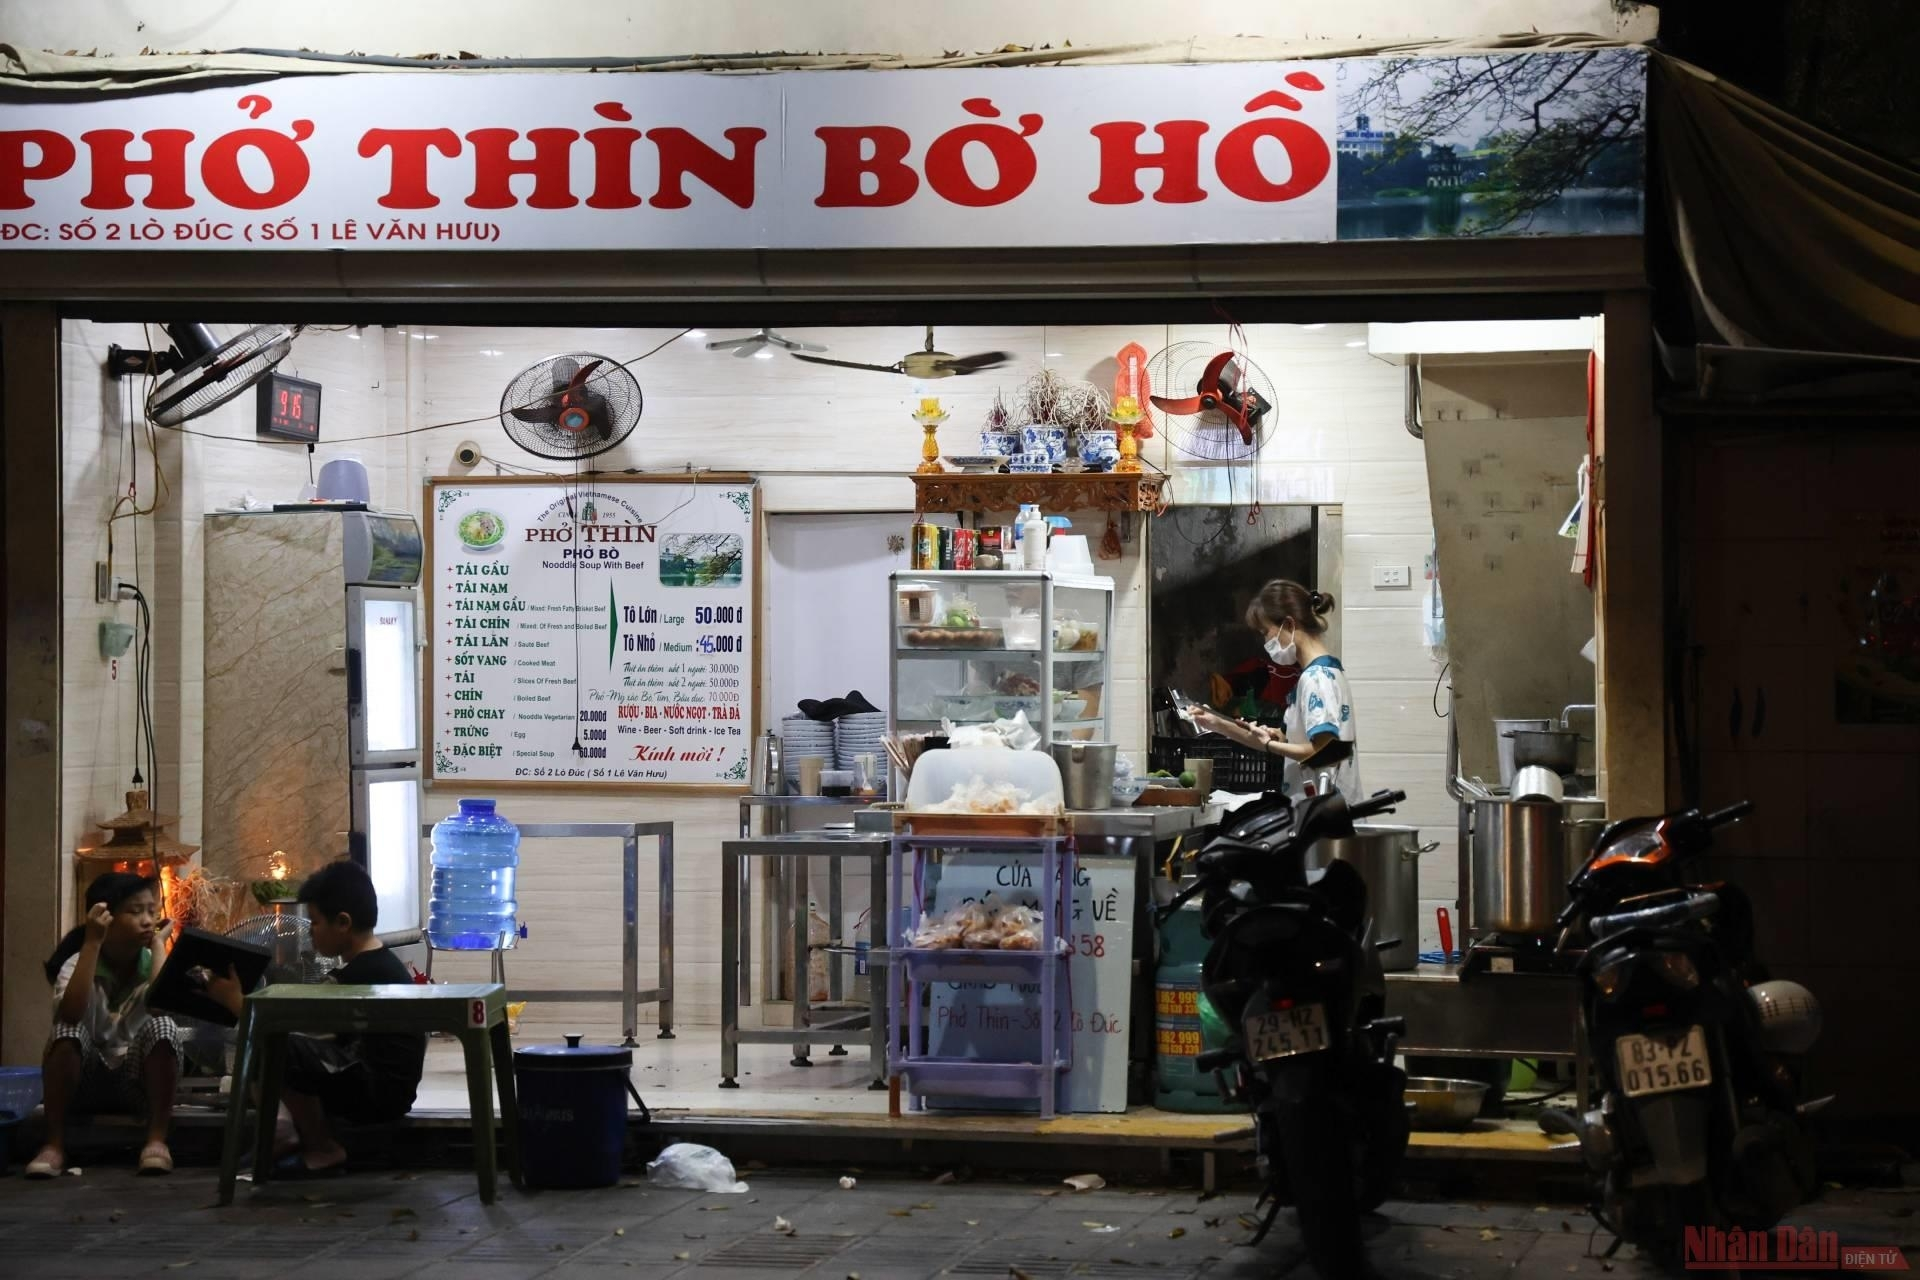 Hanoi,covid-19 pandemic,reopen